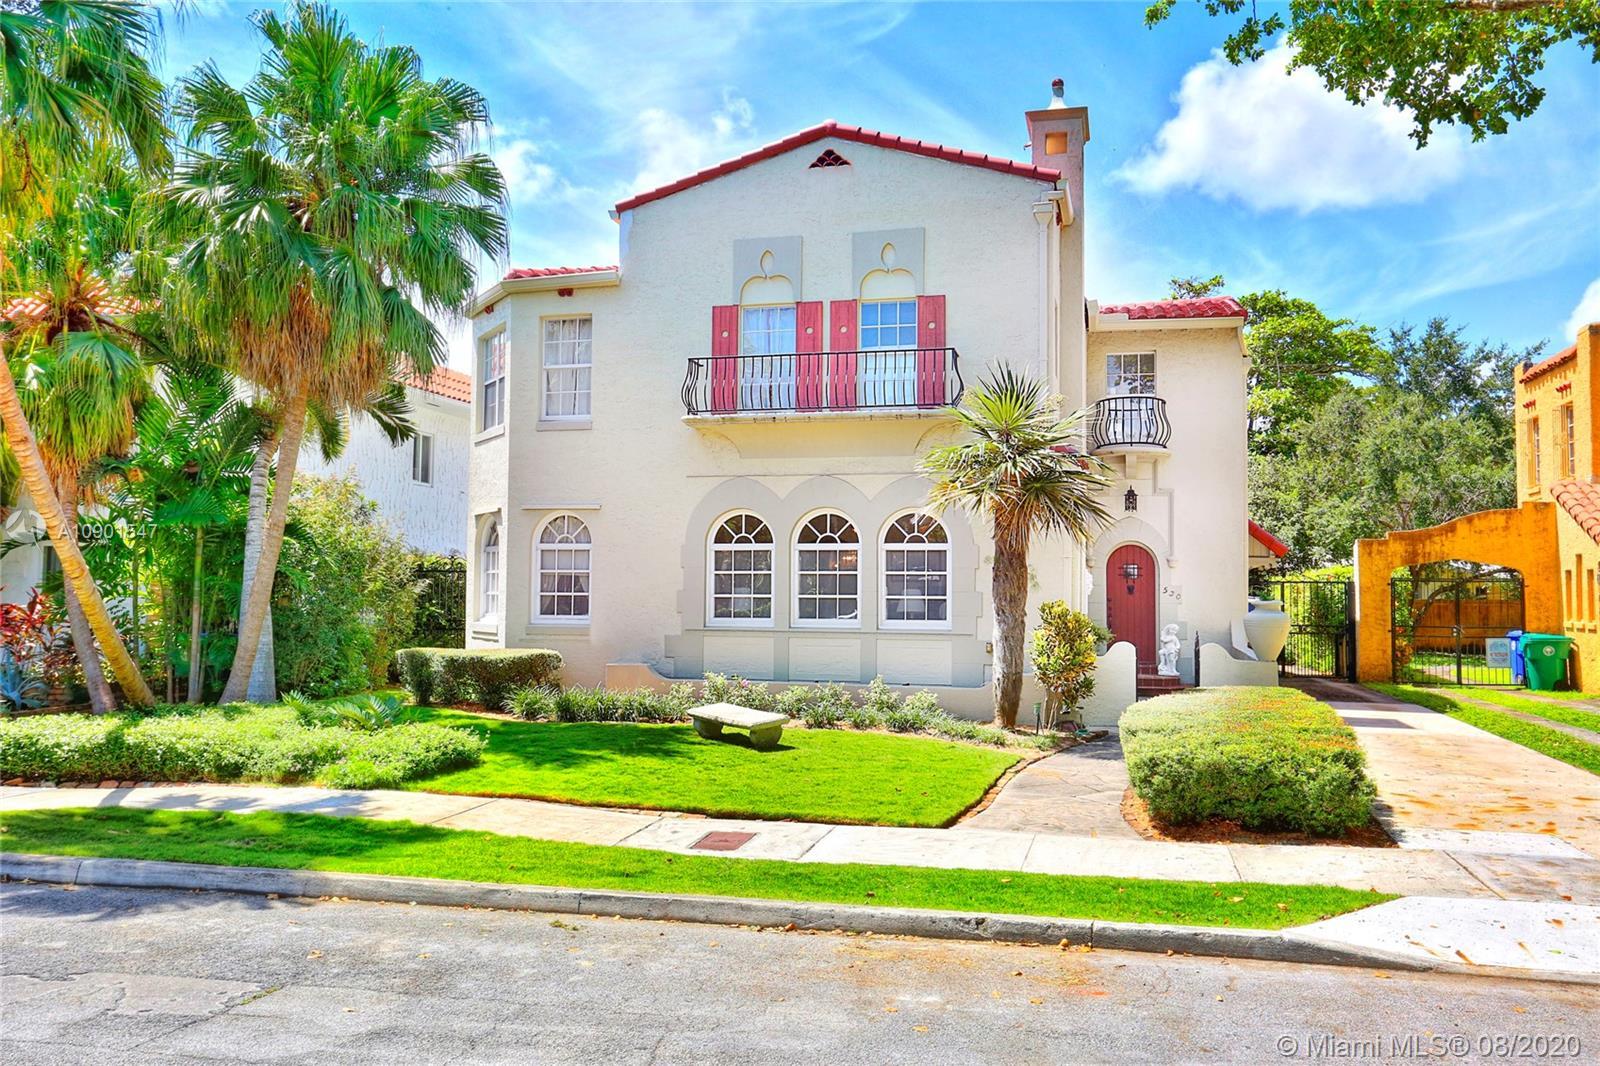 Morningside - 530 NE 59th St, Miami, FL 33137